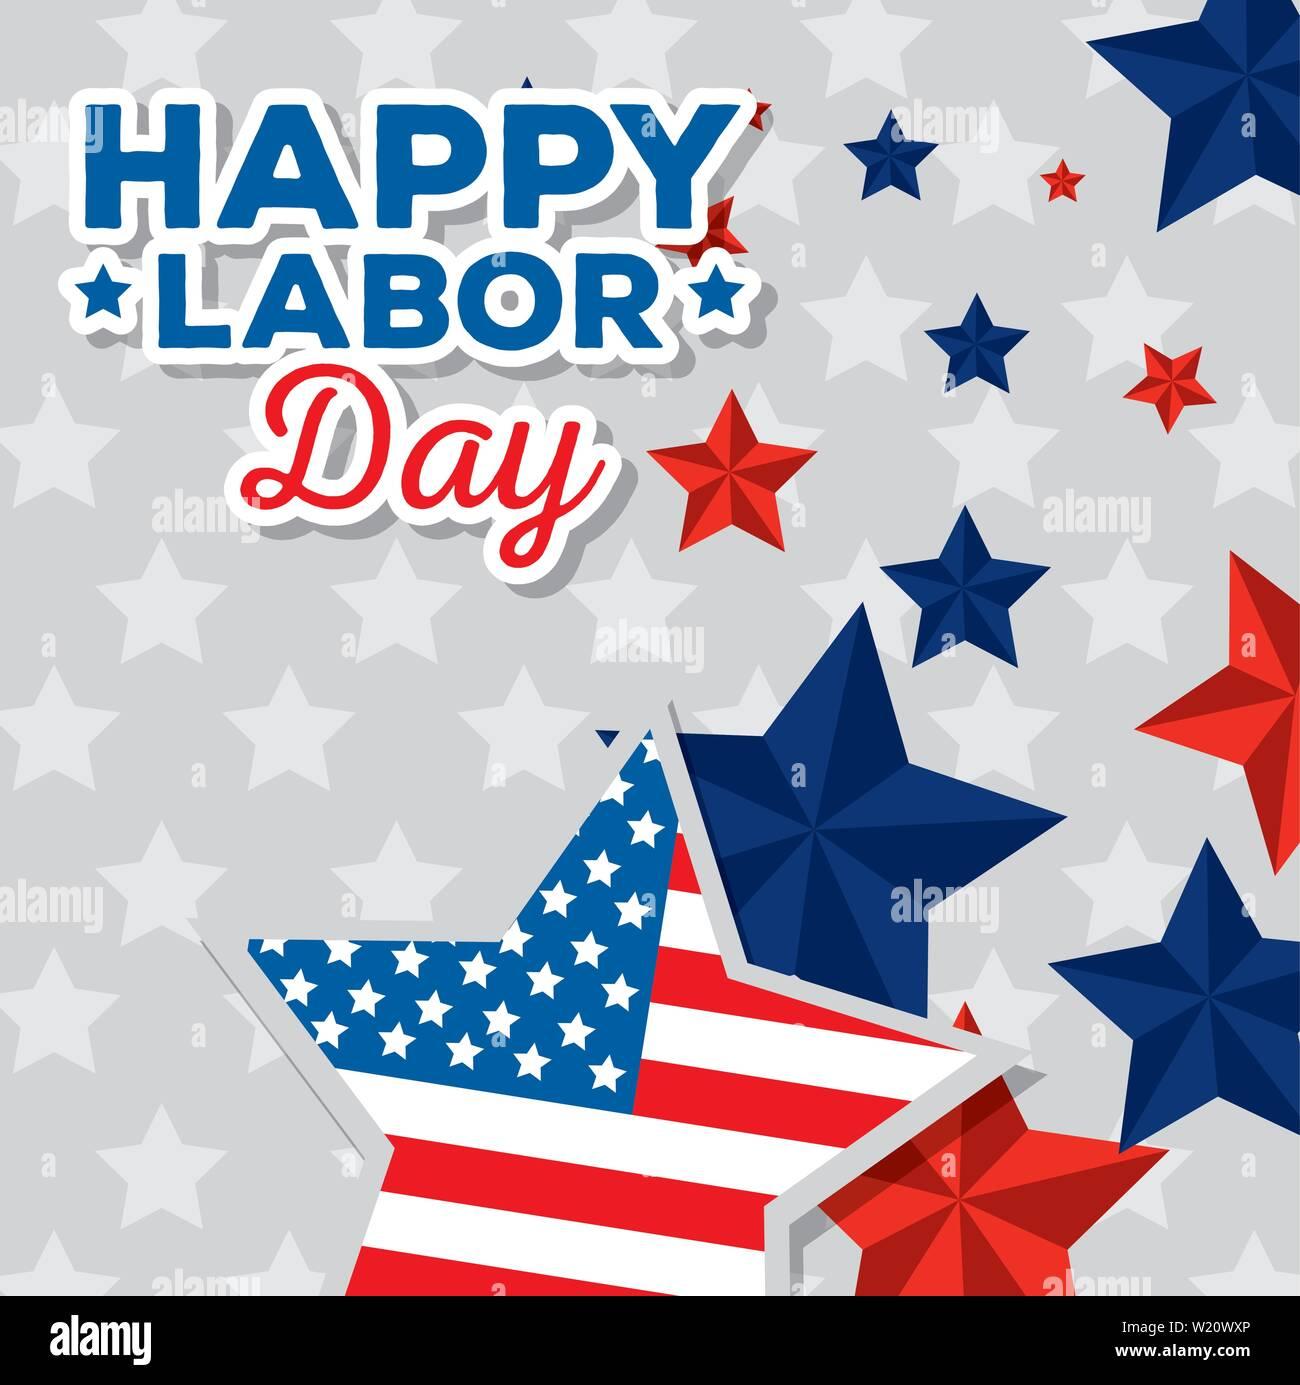 Happy Traditional Labor Day Celebration Stock Vector Art